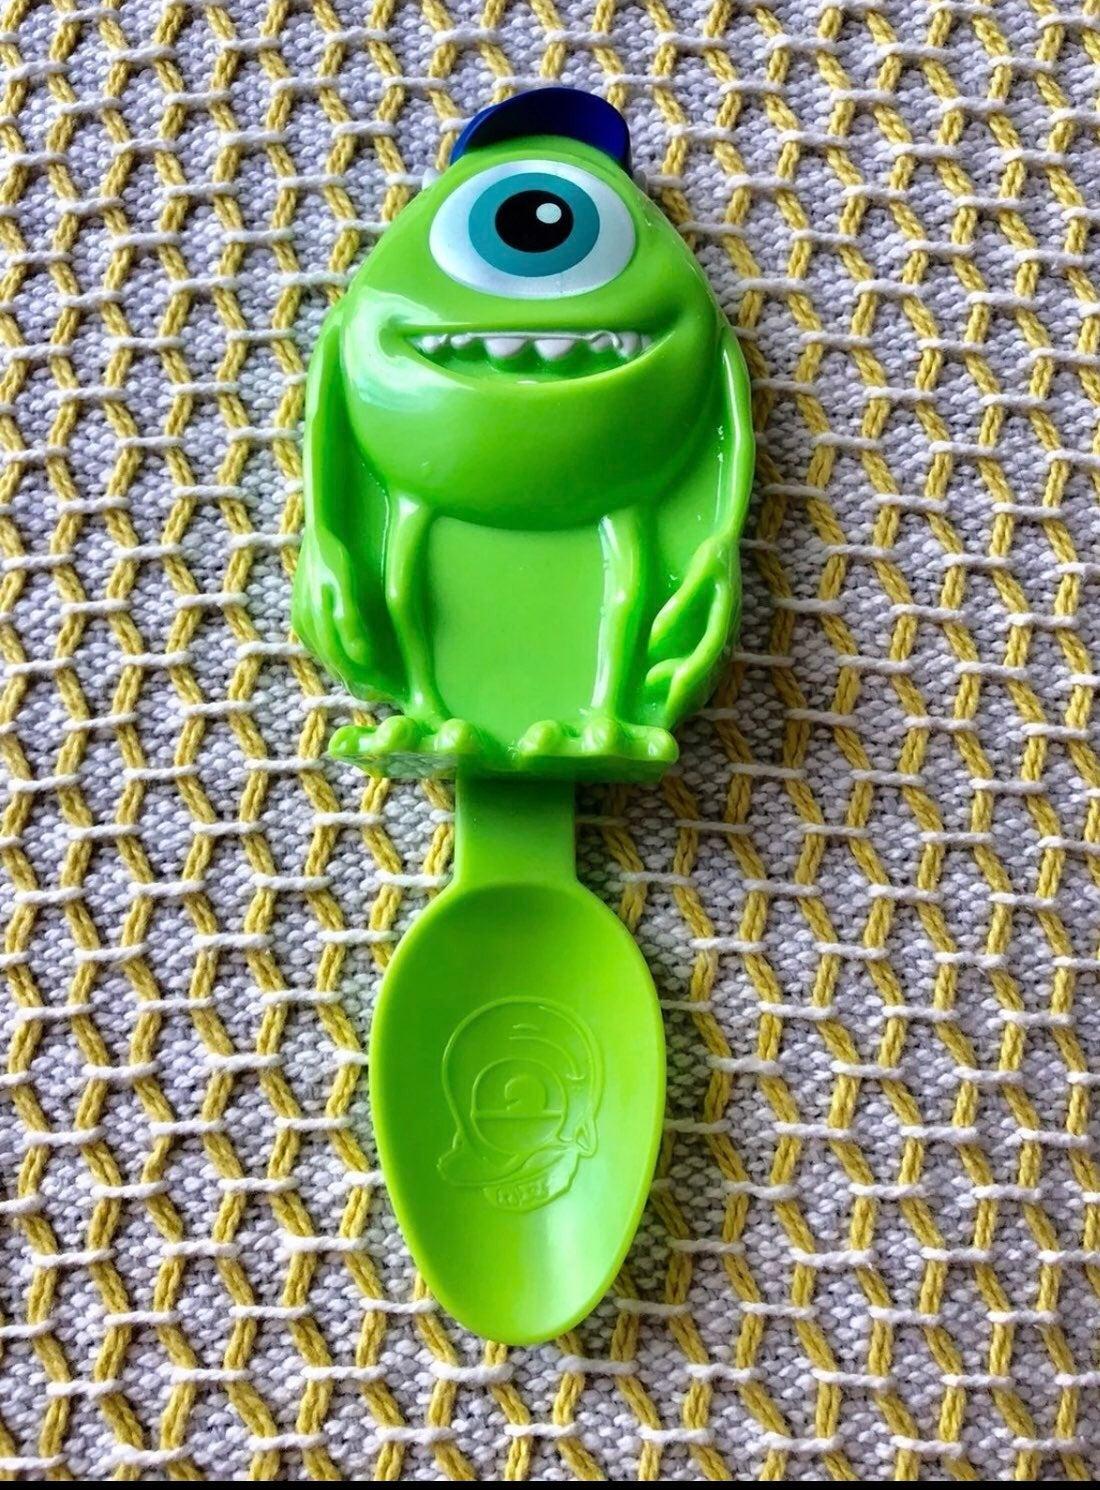 Disney pixar green spoon - new